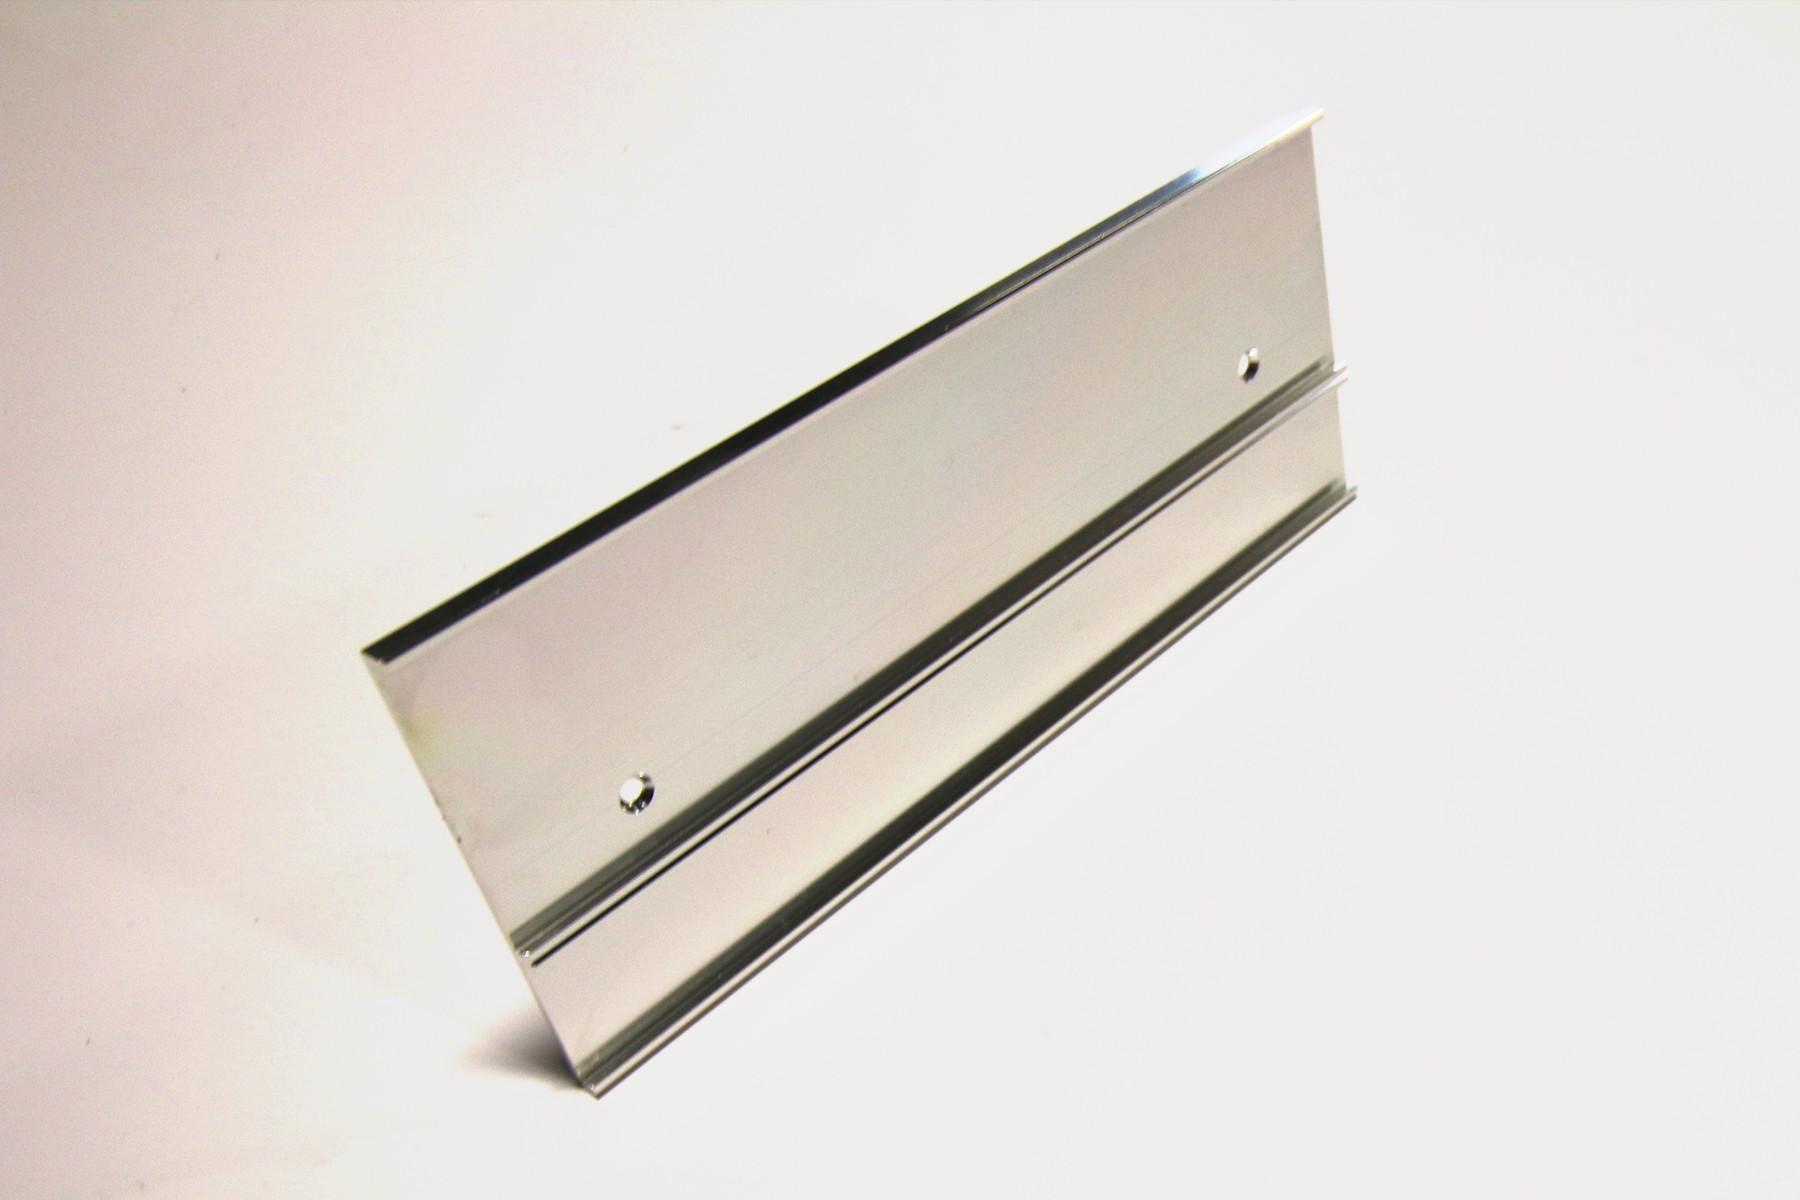 2 & 1 x 10 Multi-Wall Holder, Silver